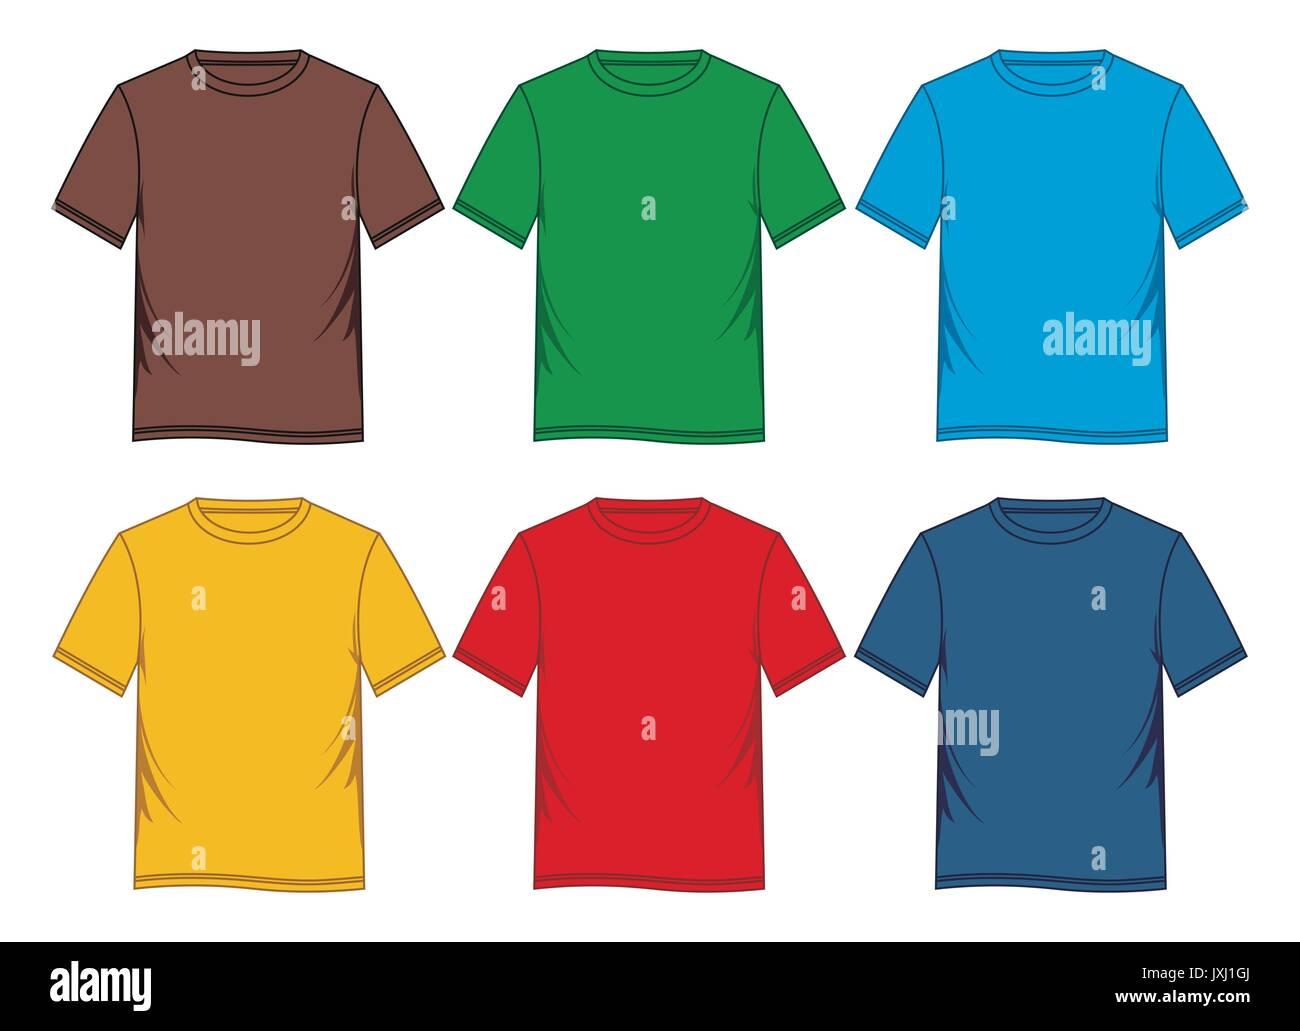 T shirt printing stock photos t shirt printing stock for T shirt printing design template